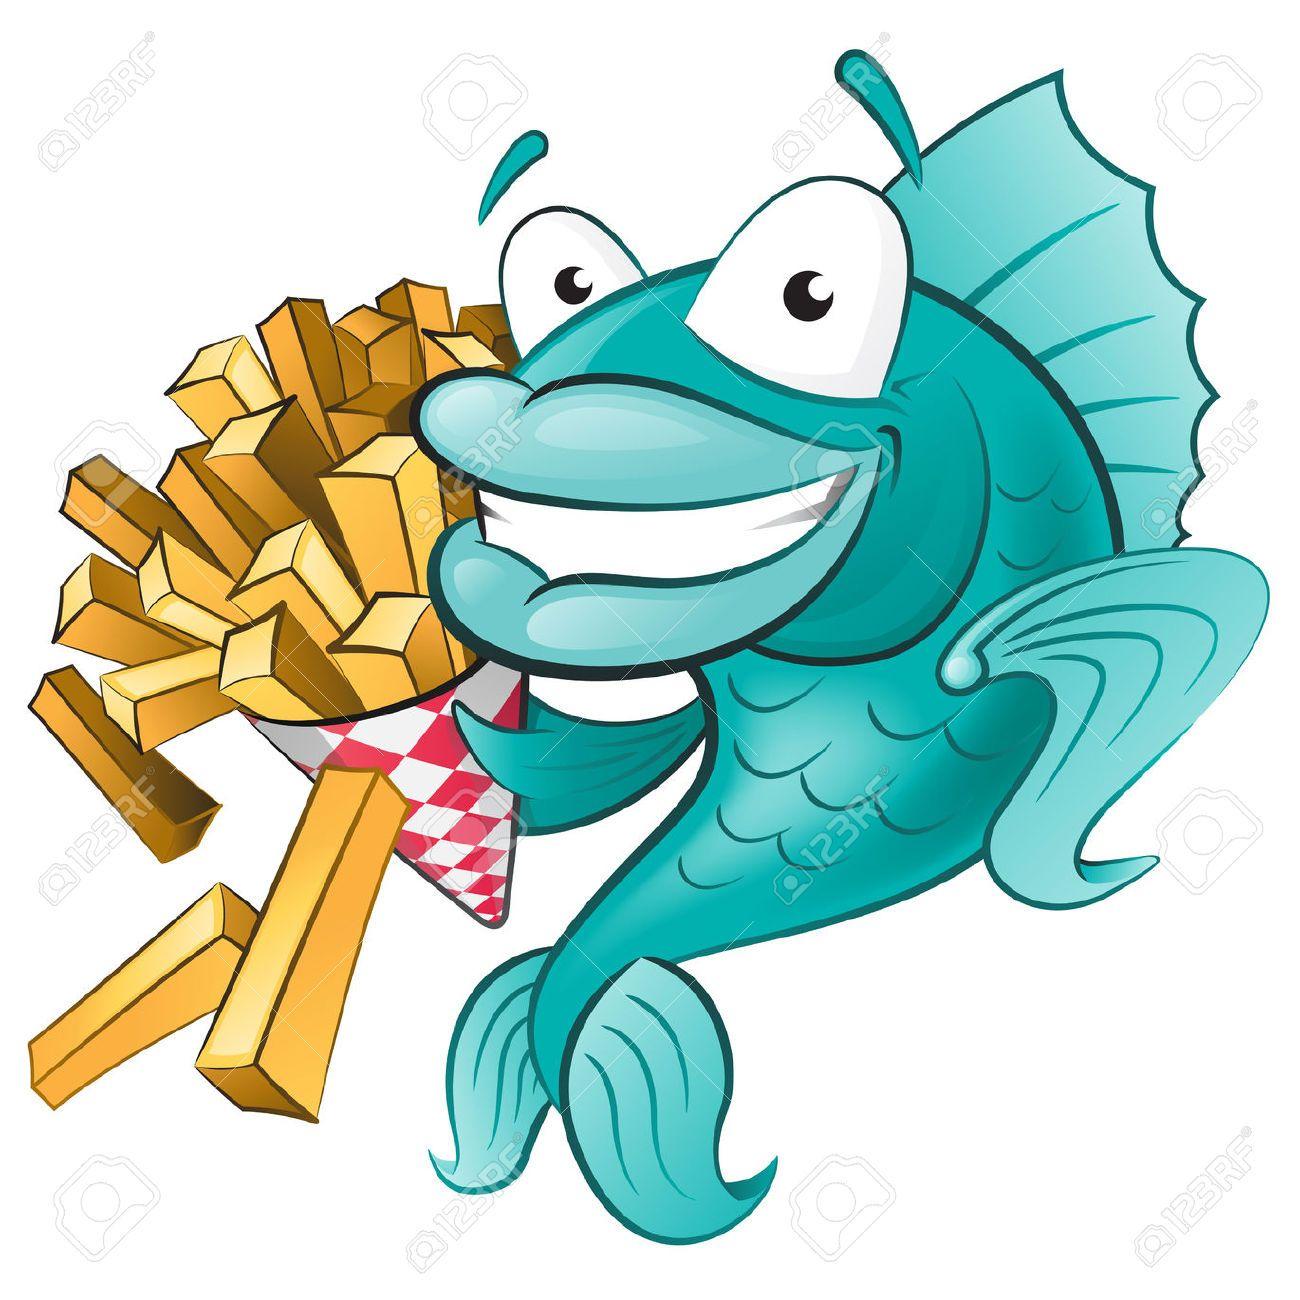 24589570 cartoon fish and chips stock vector jpg 1300 1300